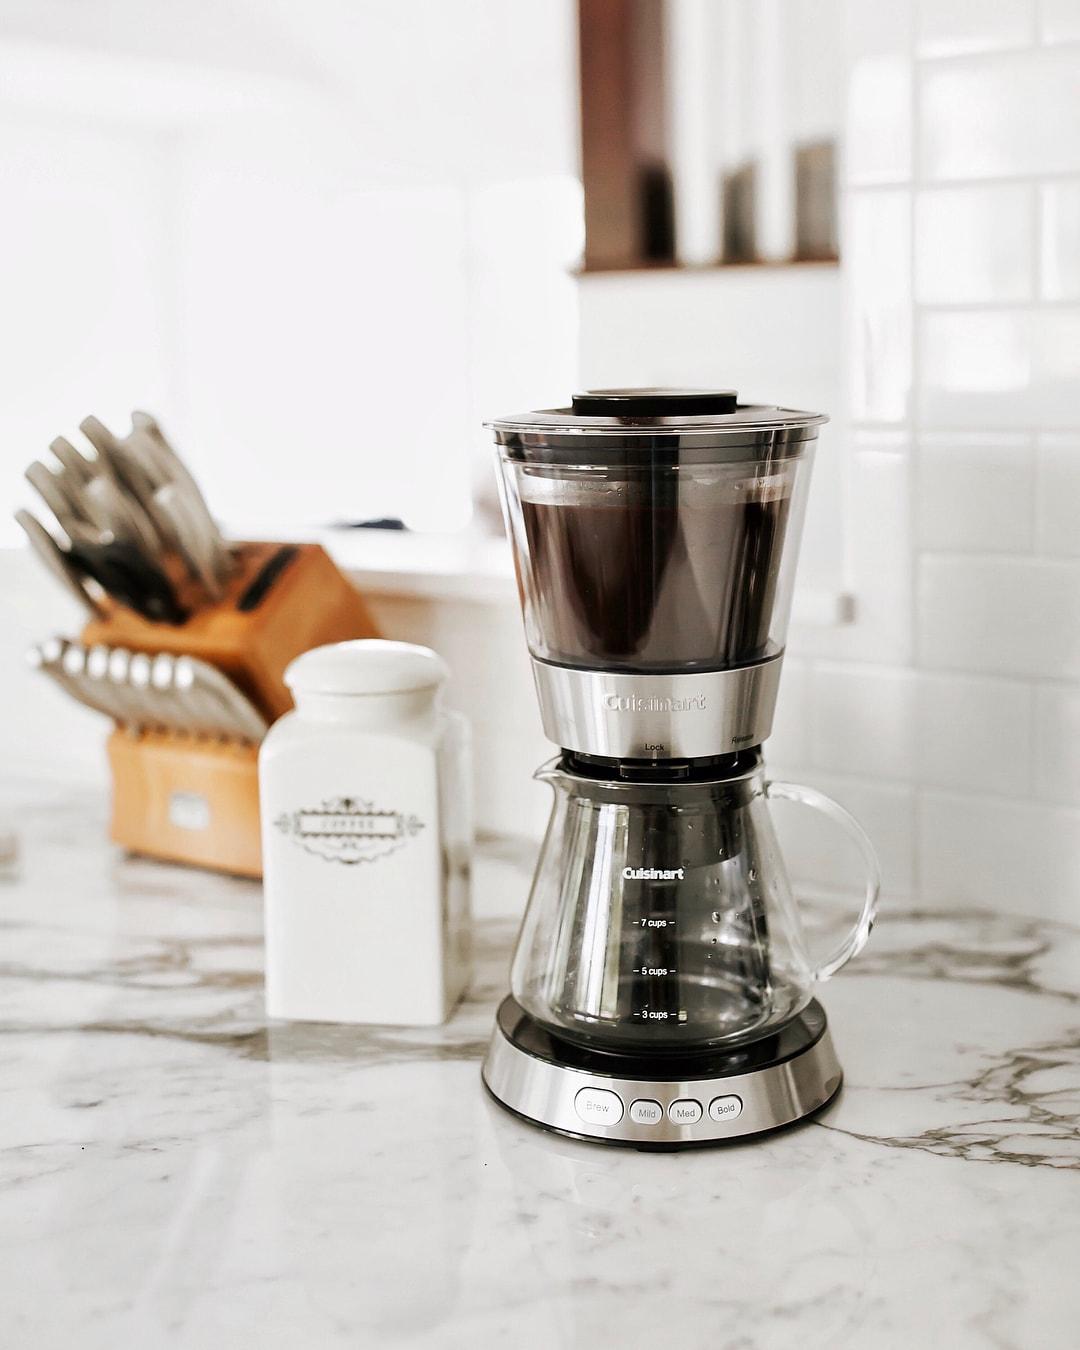 Cuisinart Cold Brew Maker Coffee Machine